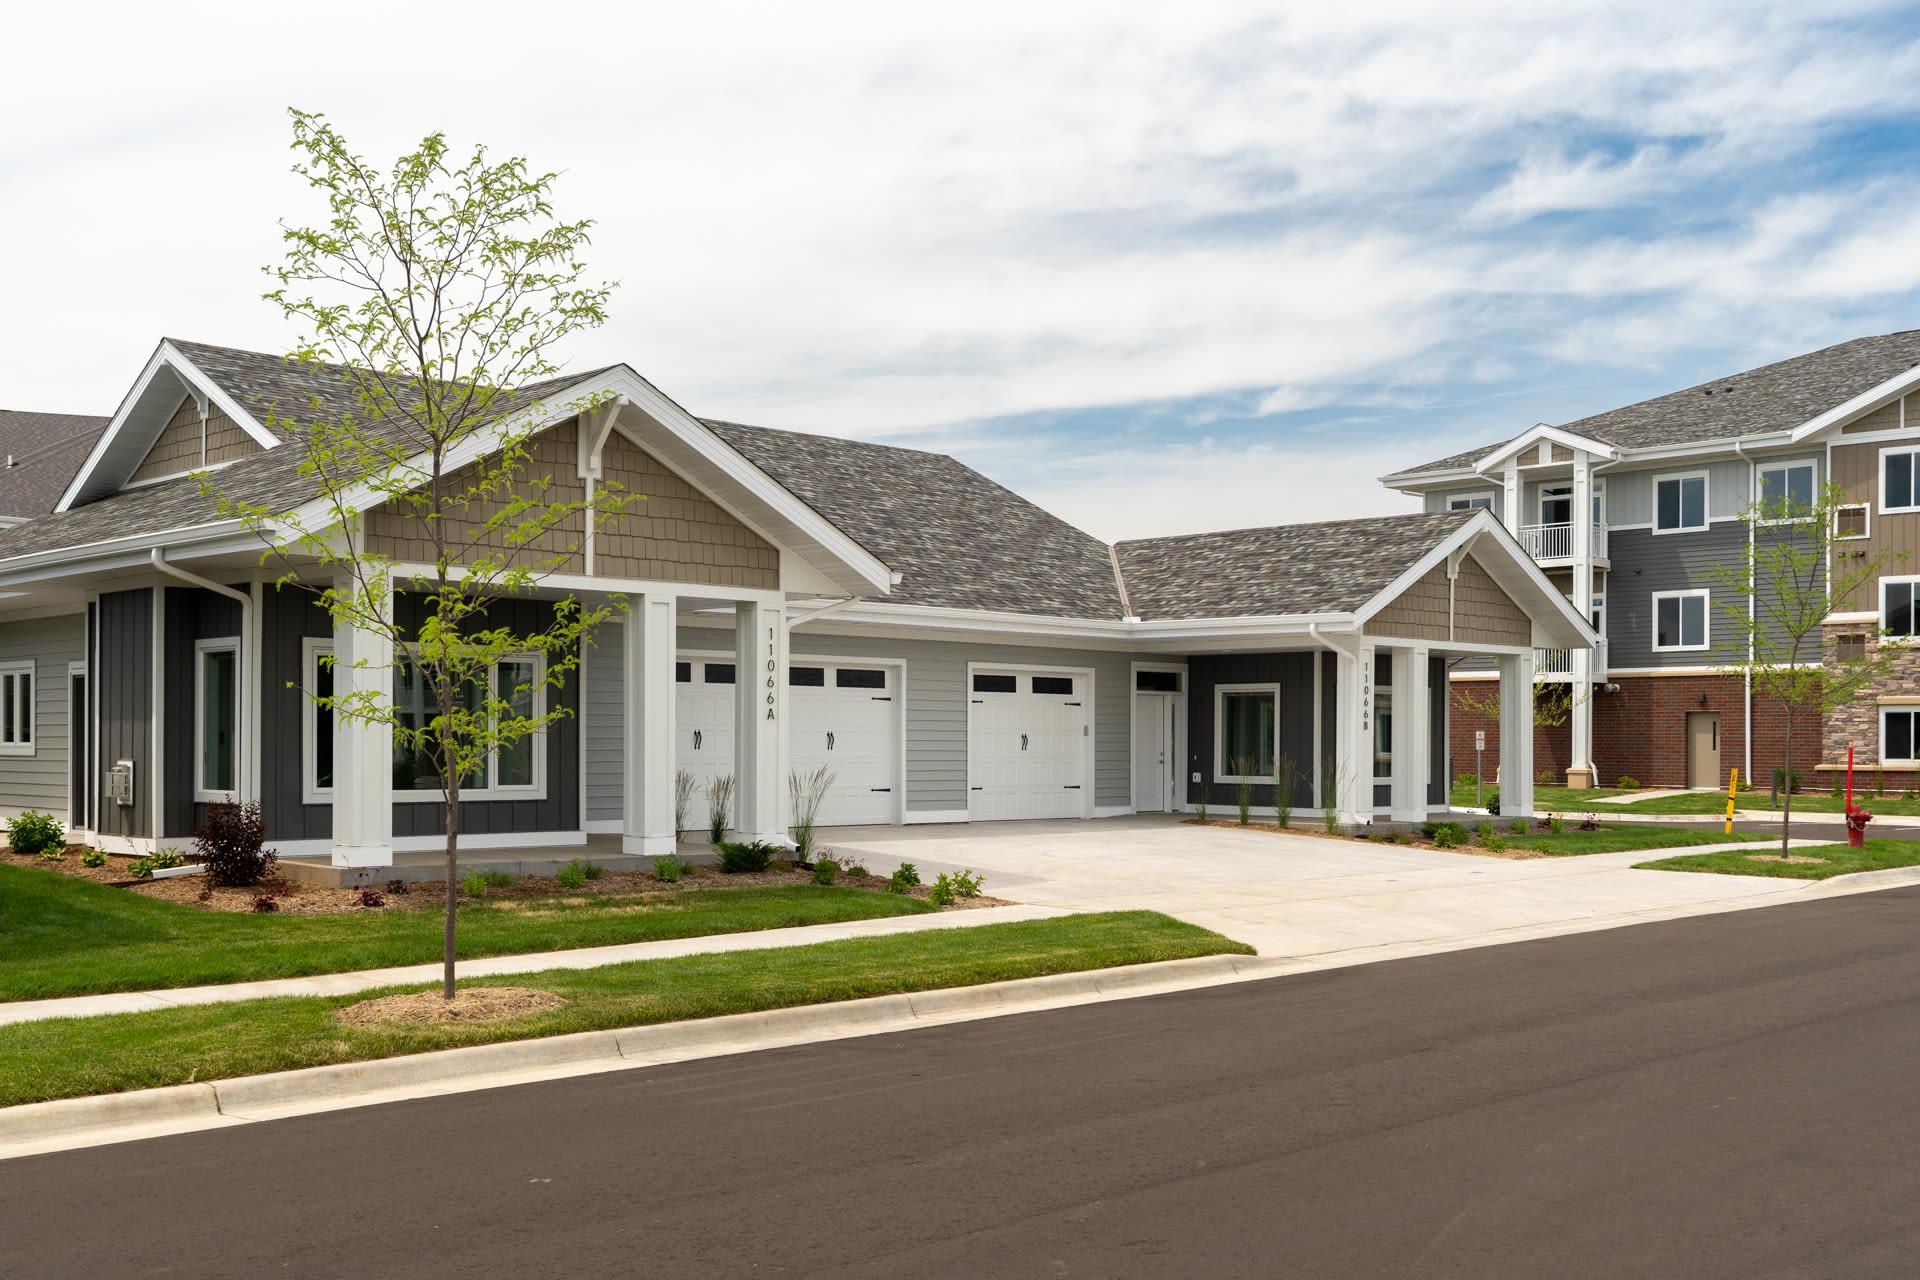 Exterior entrance of residence at The Fields at Arbor Glen in Lake Elmo, Minnesota